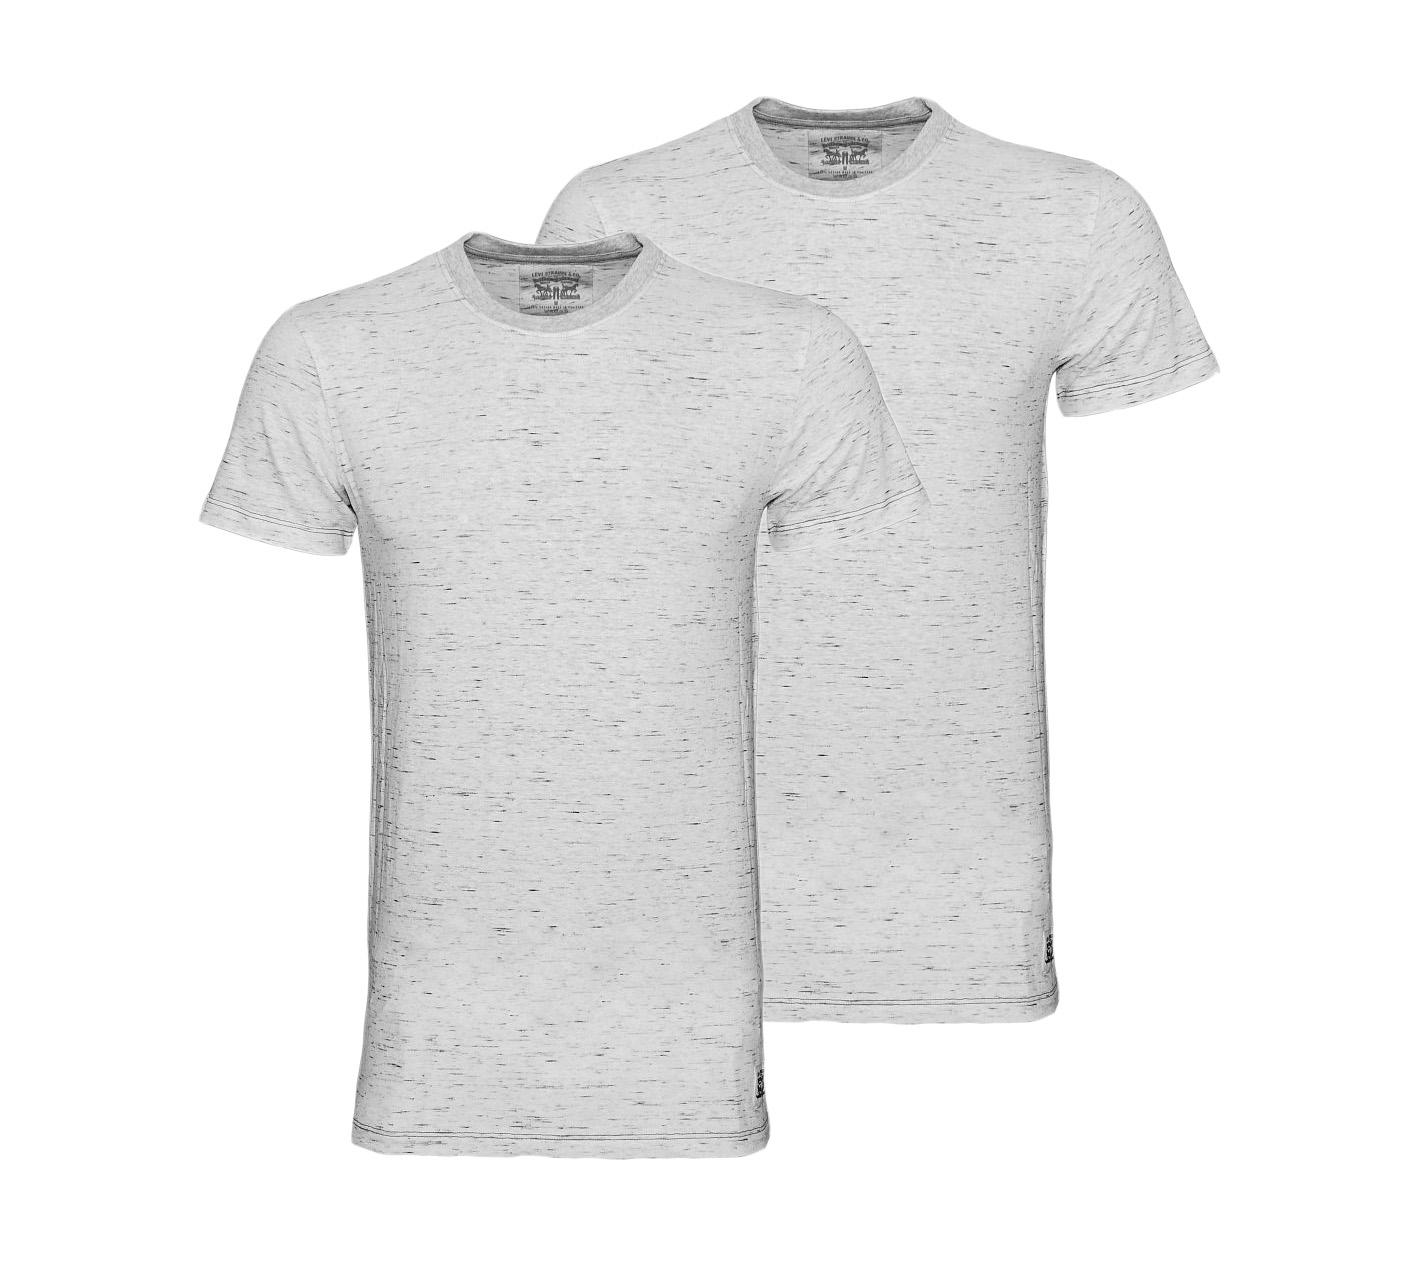 LEVIS Shirts 2er Pack T-Shirt 972001001 032 grey melange SF17-LVSS2